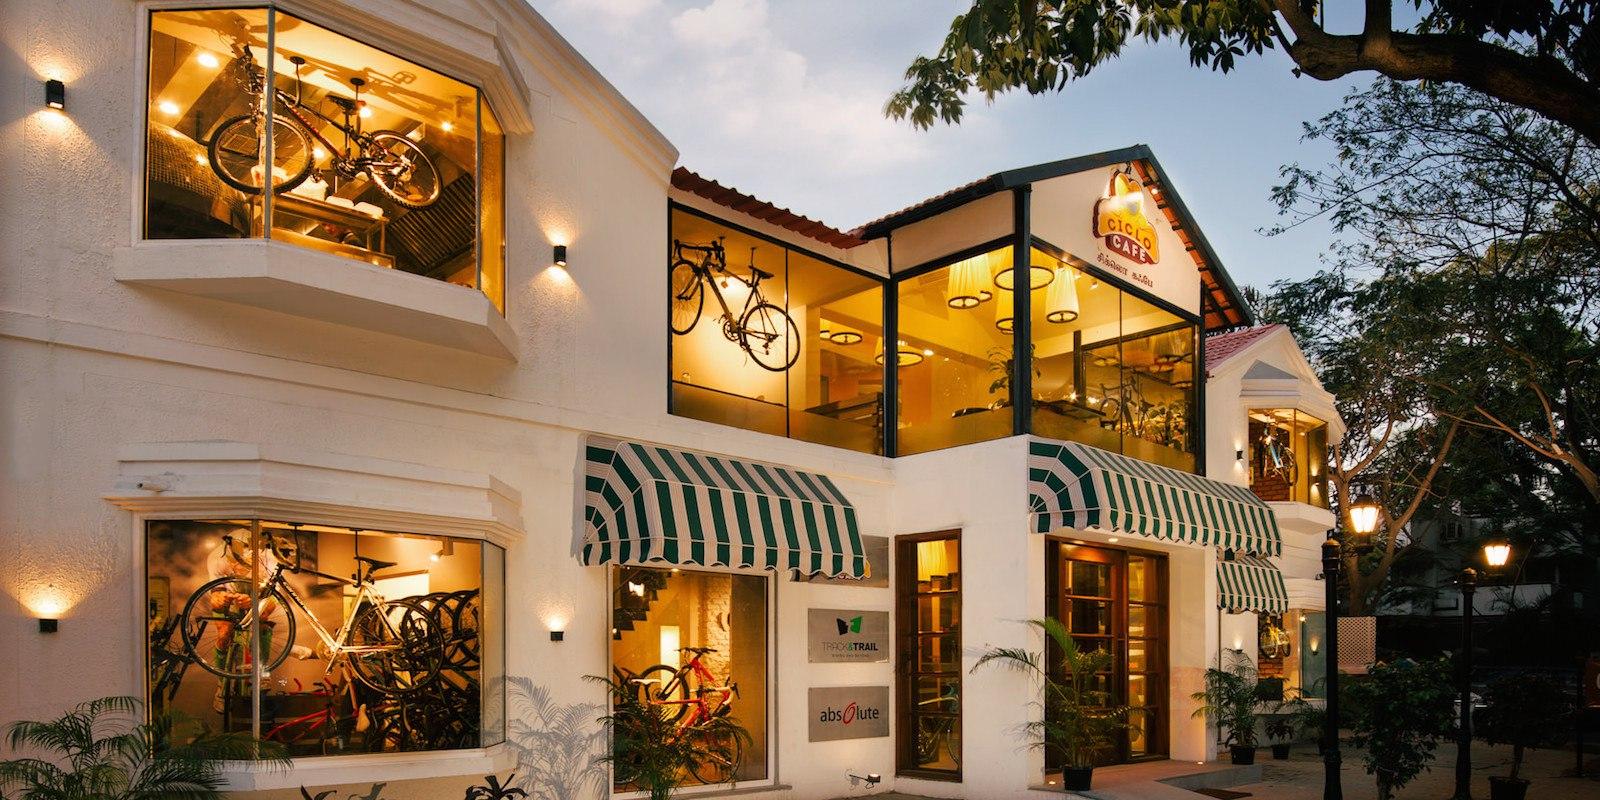 The Ciclo Cafe | Courtesy of Zomato